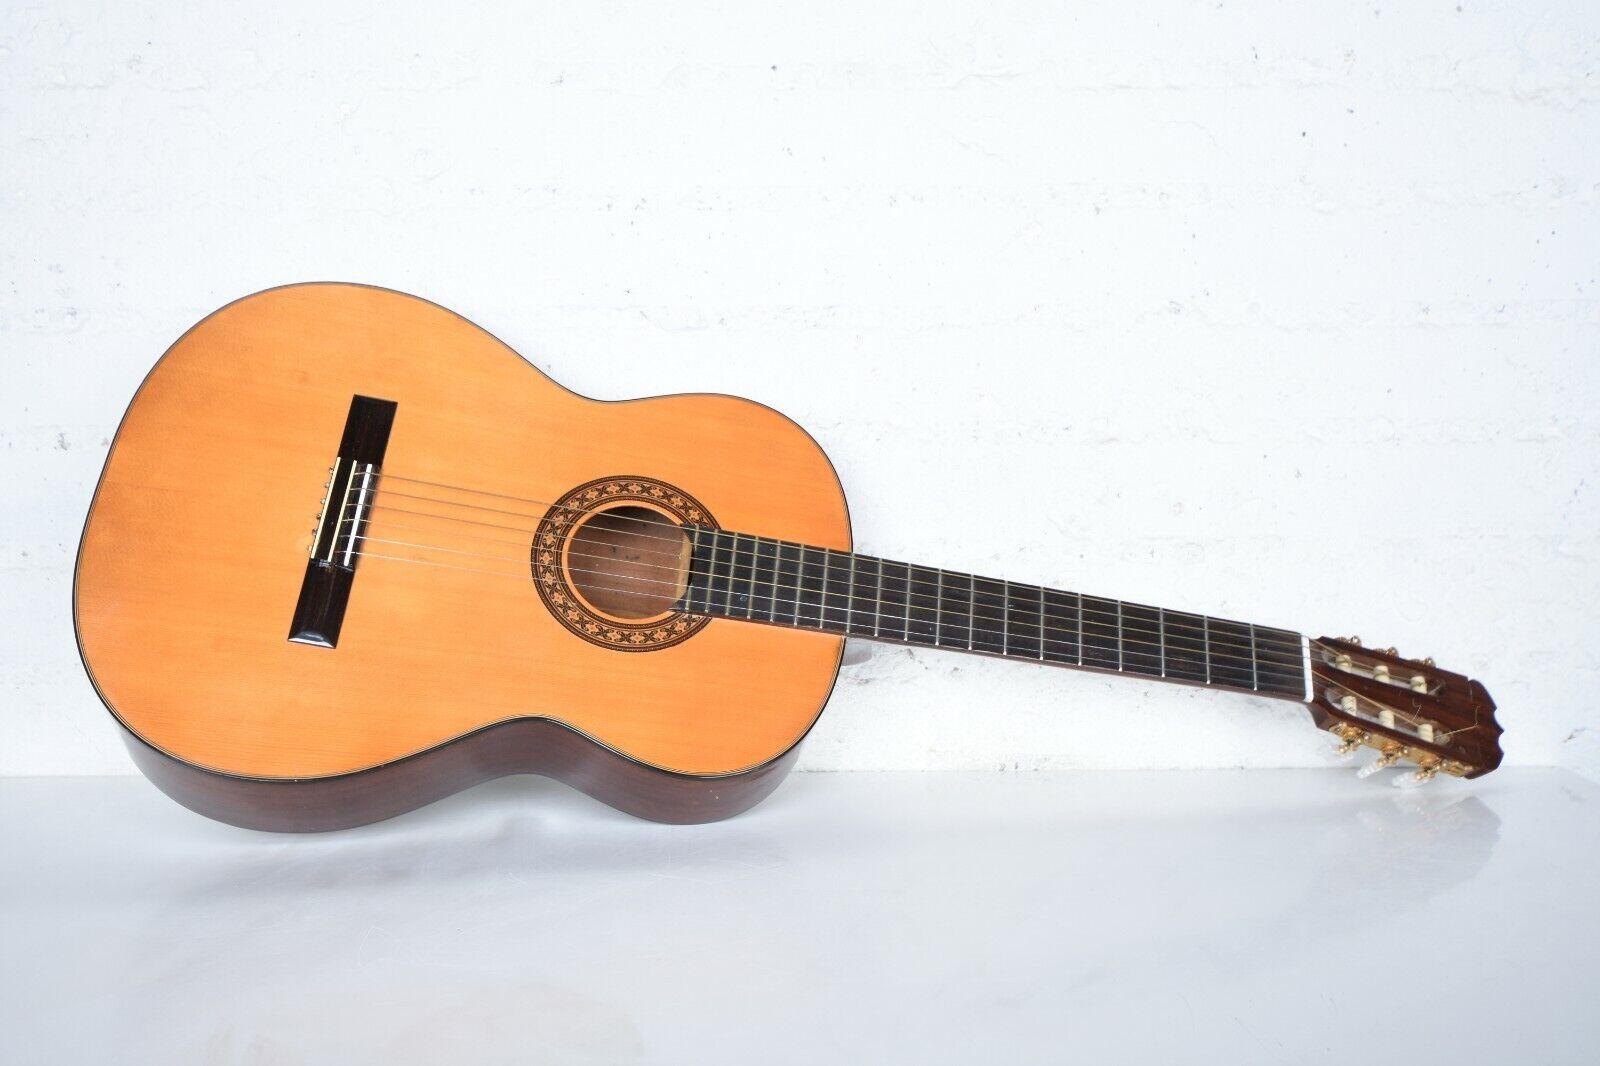 Classic M. Hohner 1970's Vintage 6 String Acoustic Guitar HG-19 Japan